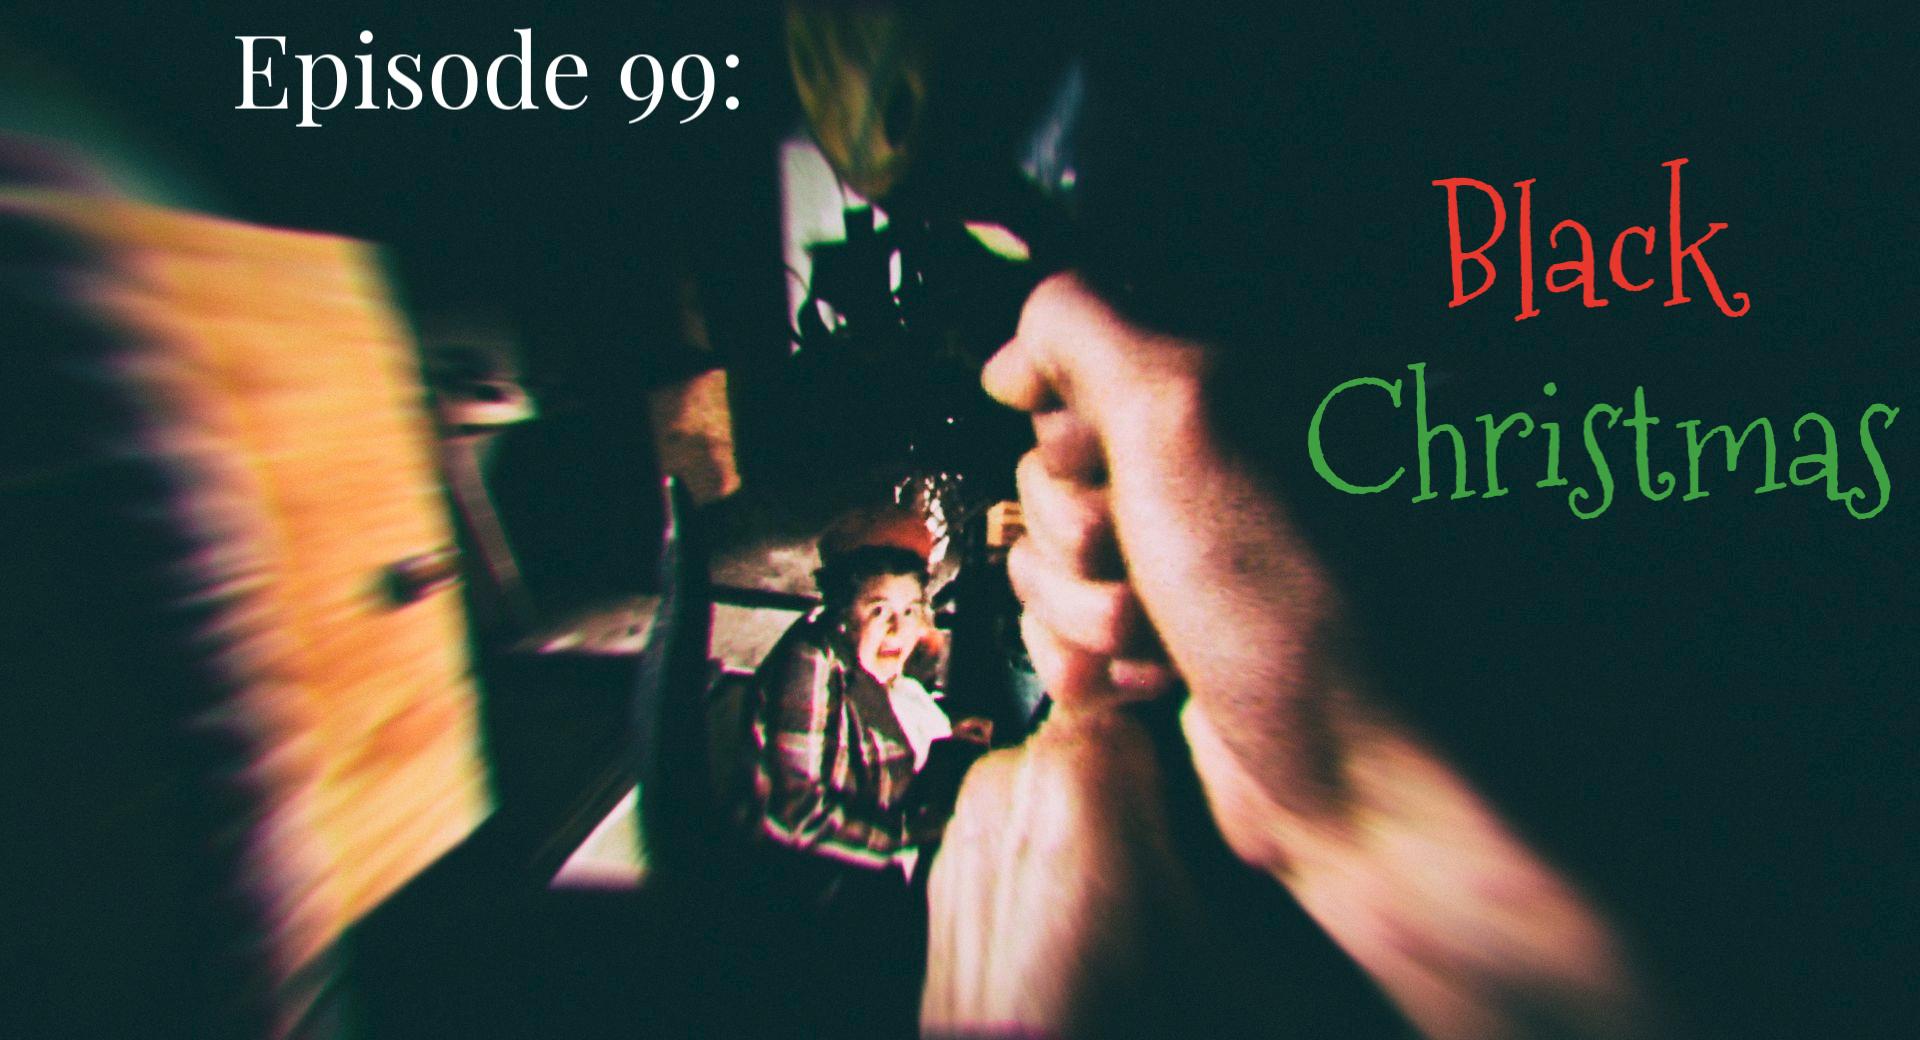 Black-Christmas-title.jpg